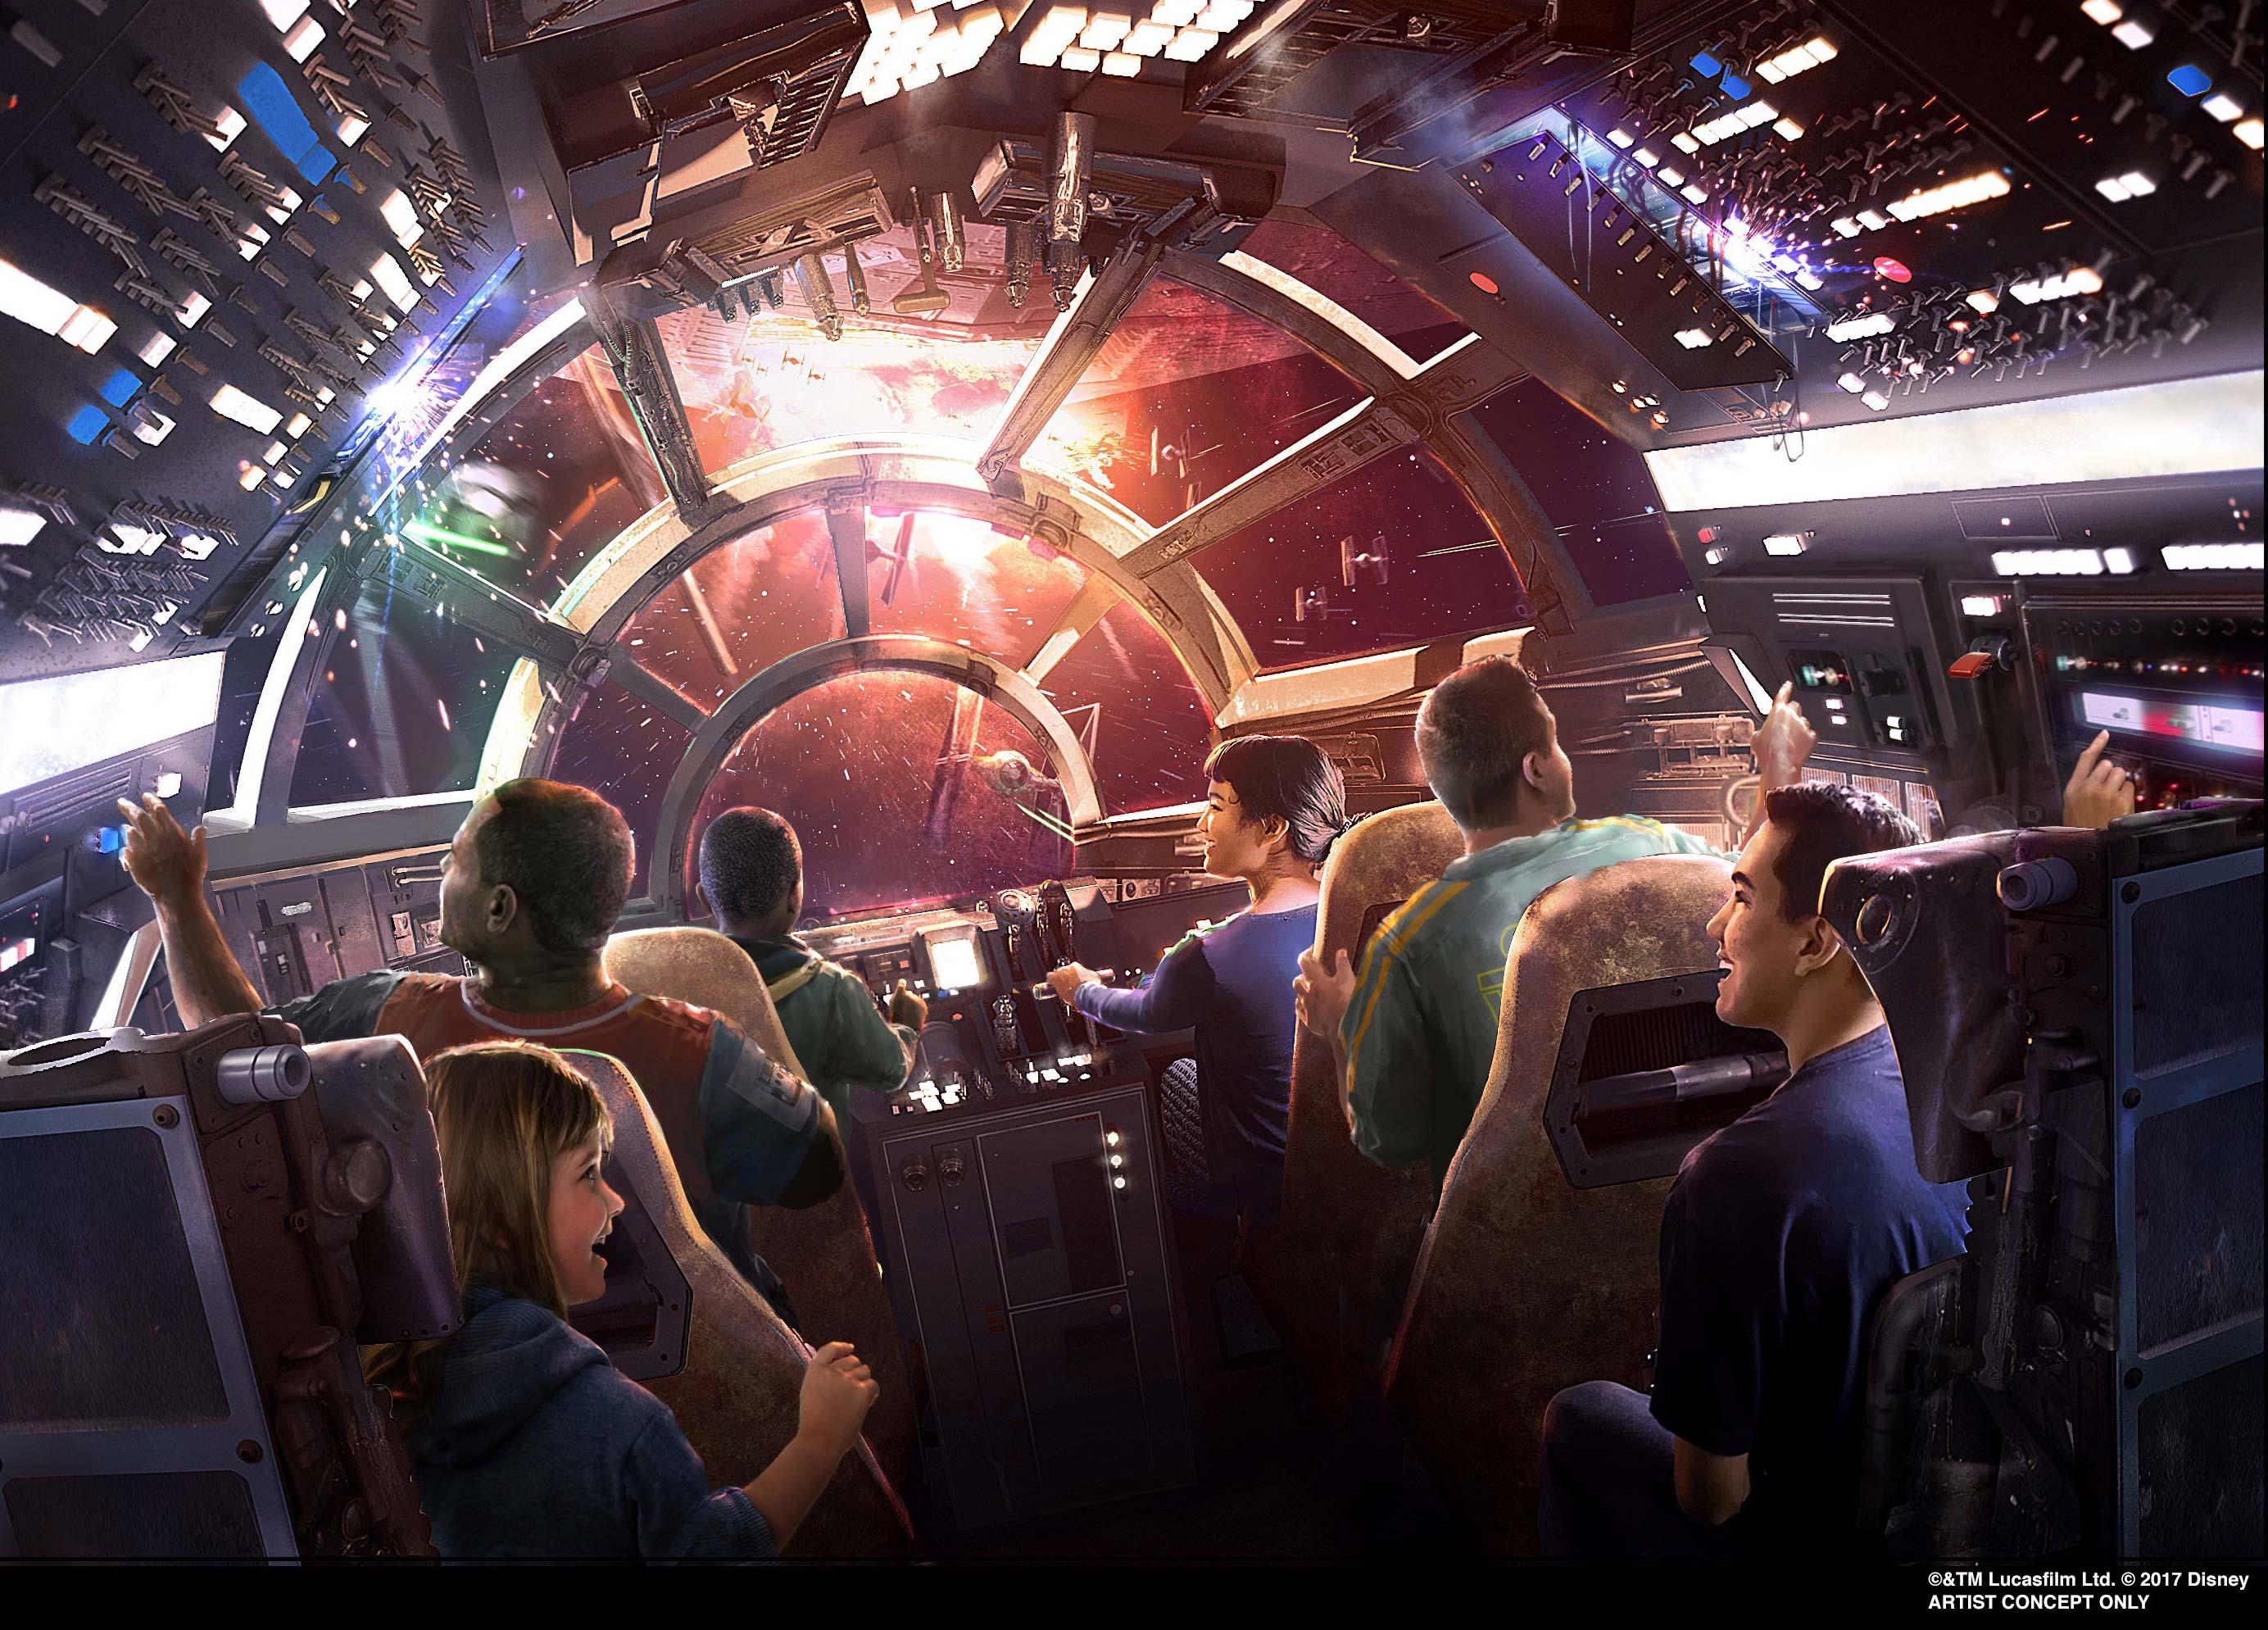 Millennium Falcon ride in Star Wars Galaxy's Edge